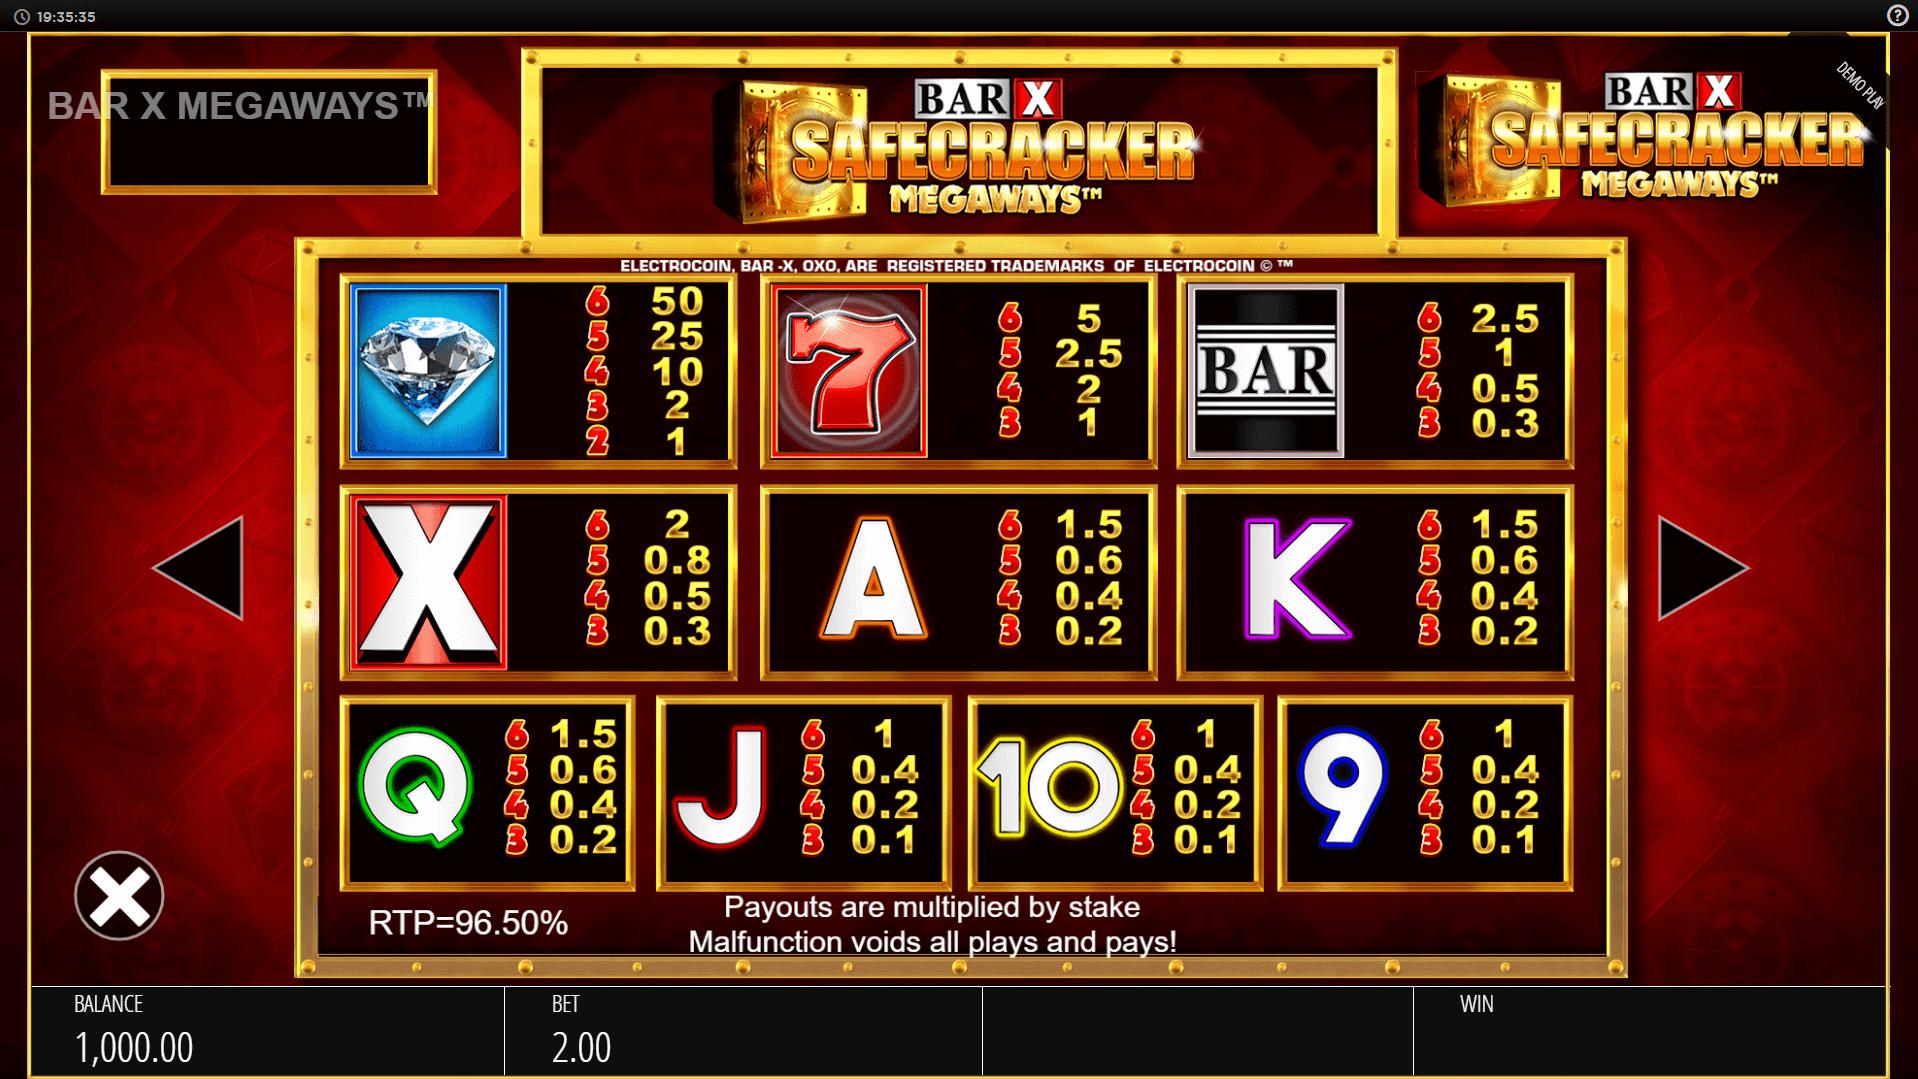 Bar X Safecracker Megaways Slot Machine